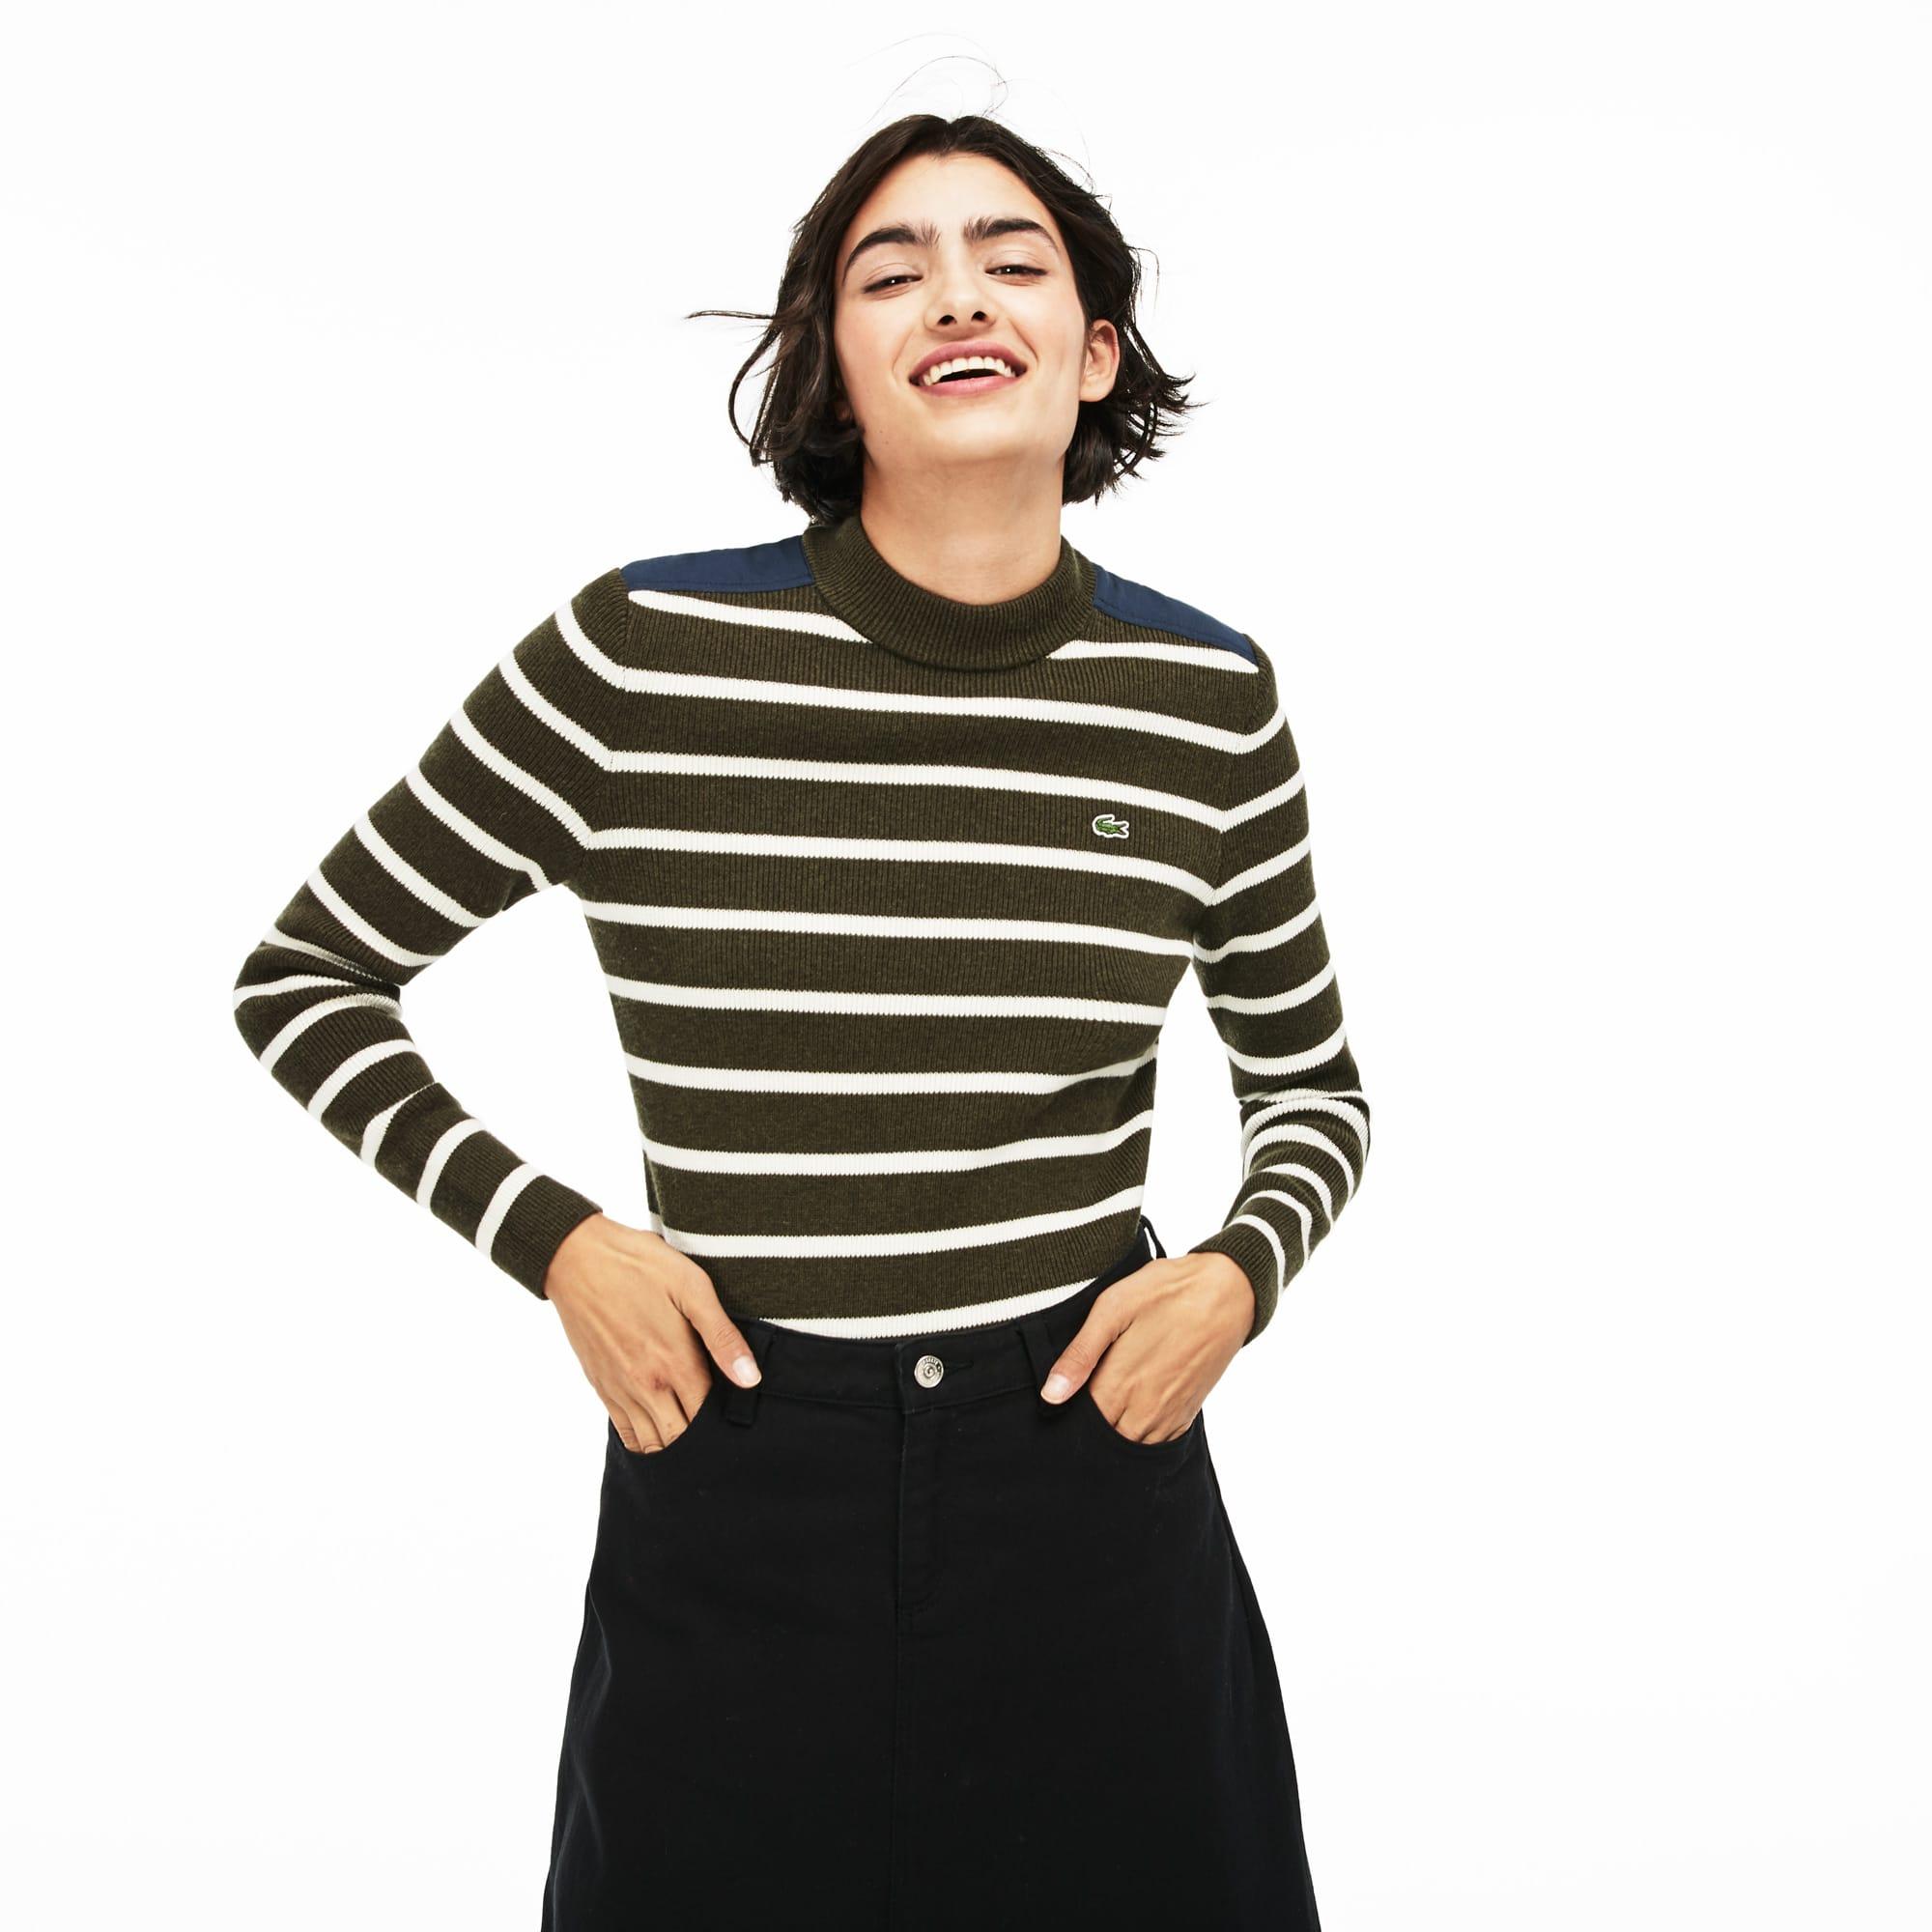 Women's LIVE Crew Neck Striped Interlock Sweater